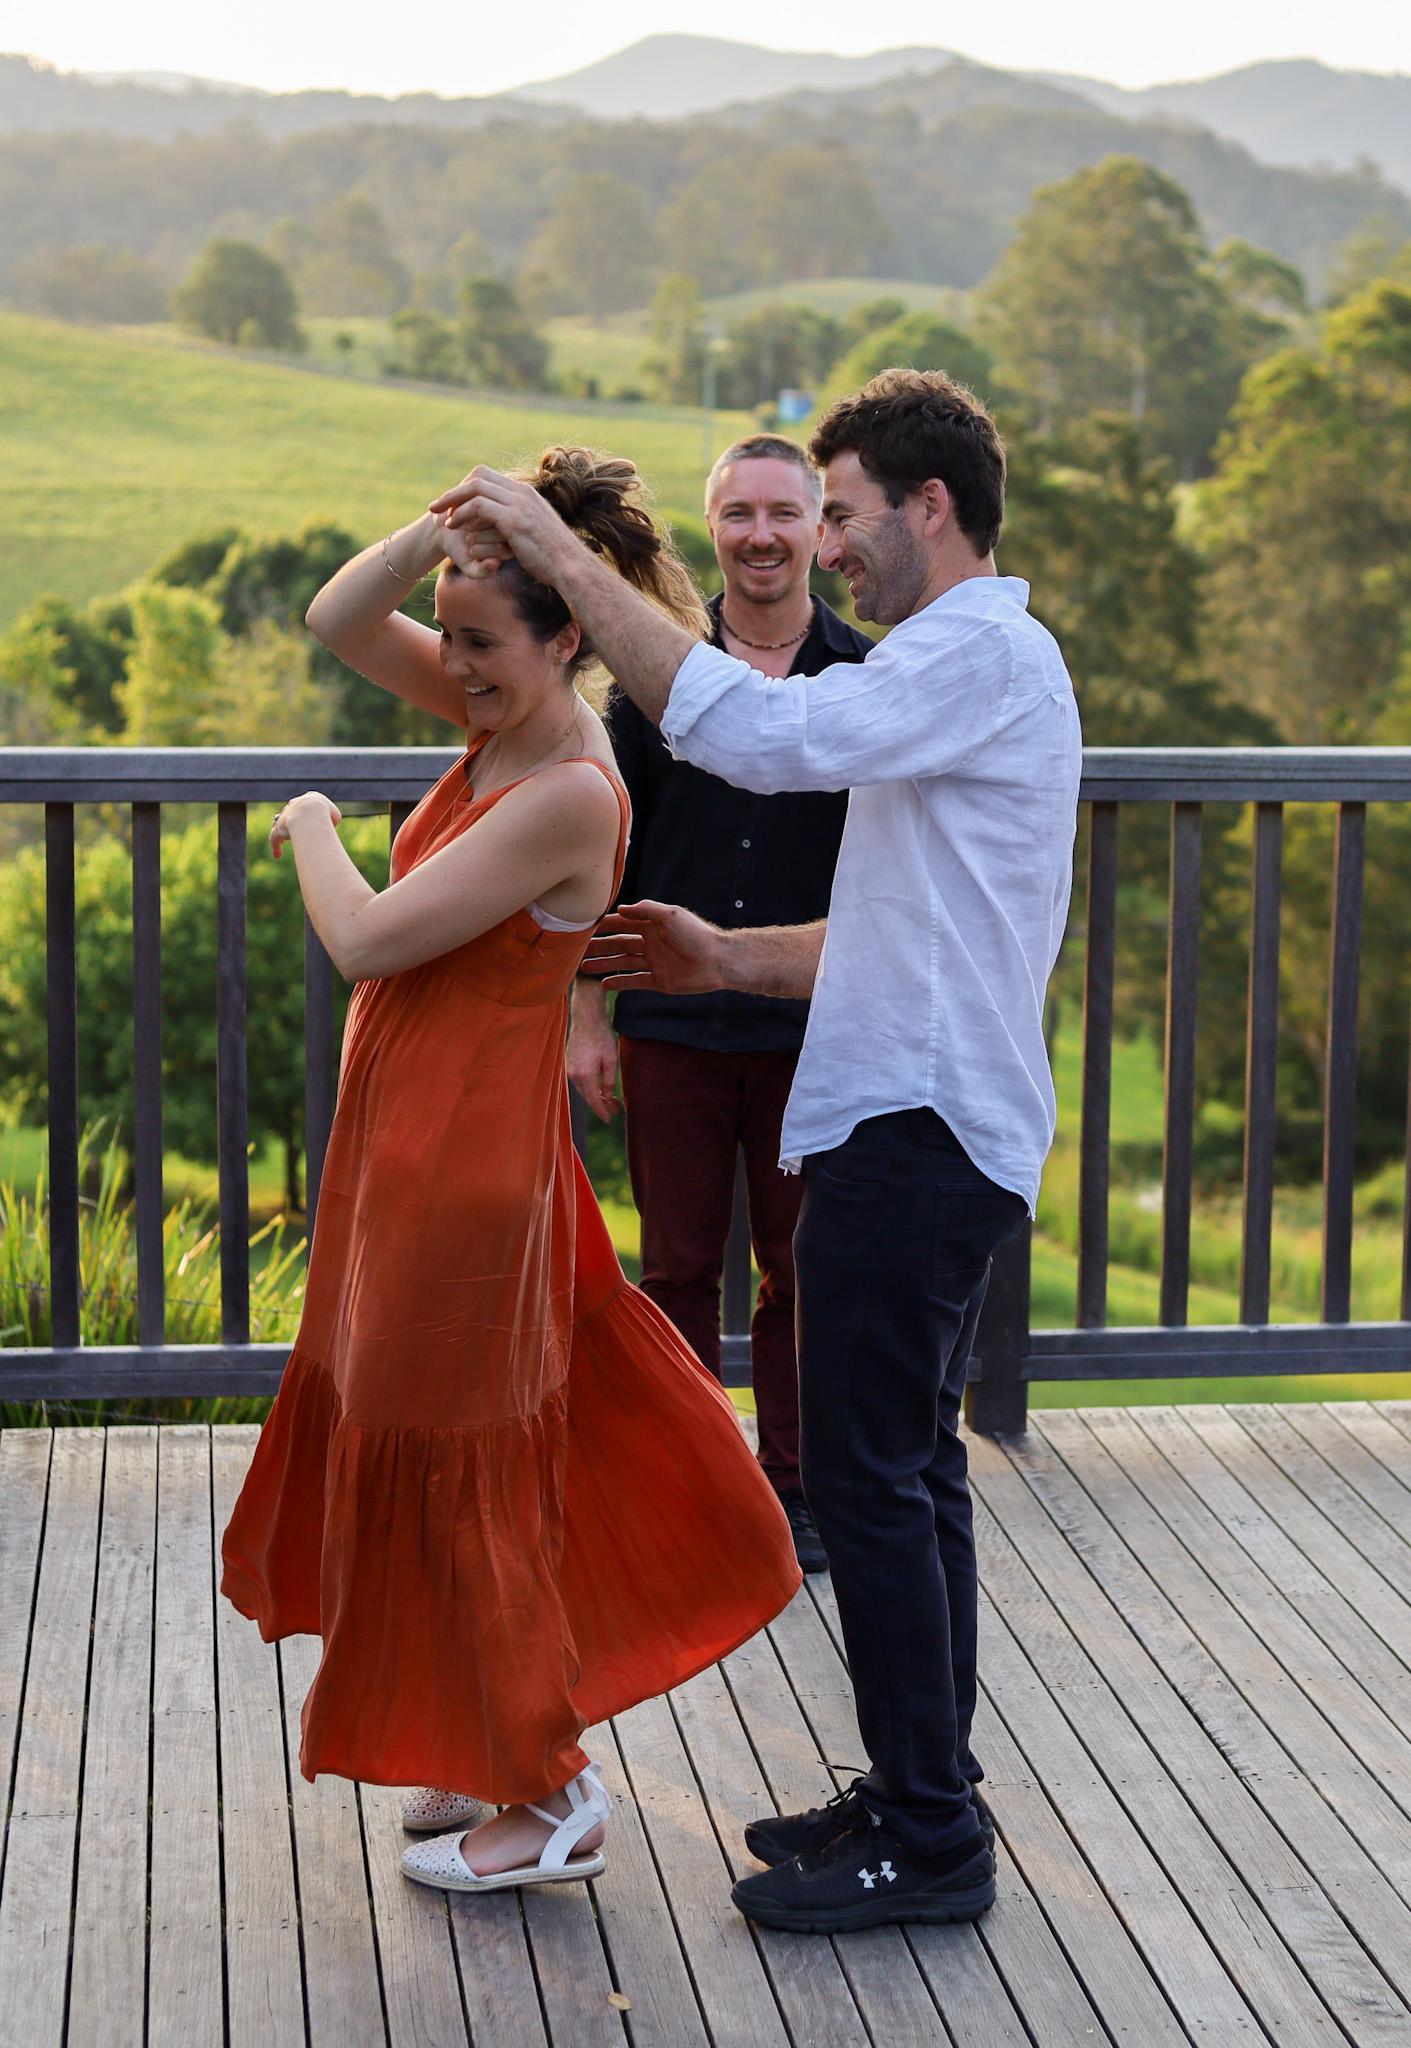 Spin Wedding Dance Lesson choreography